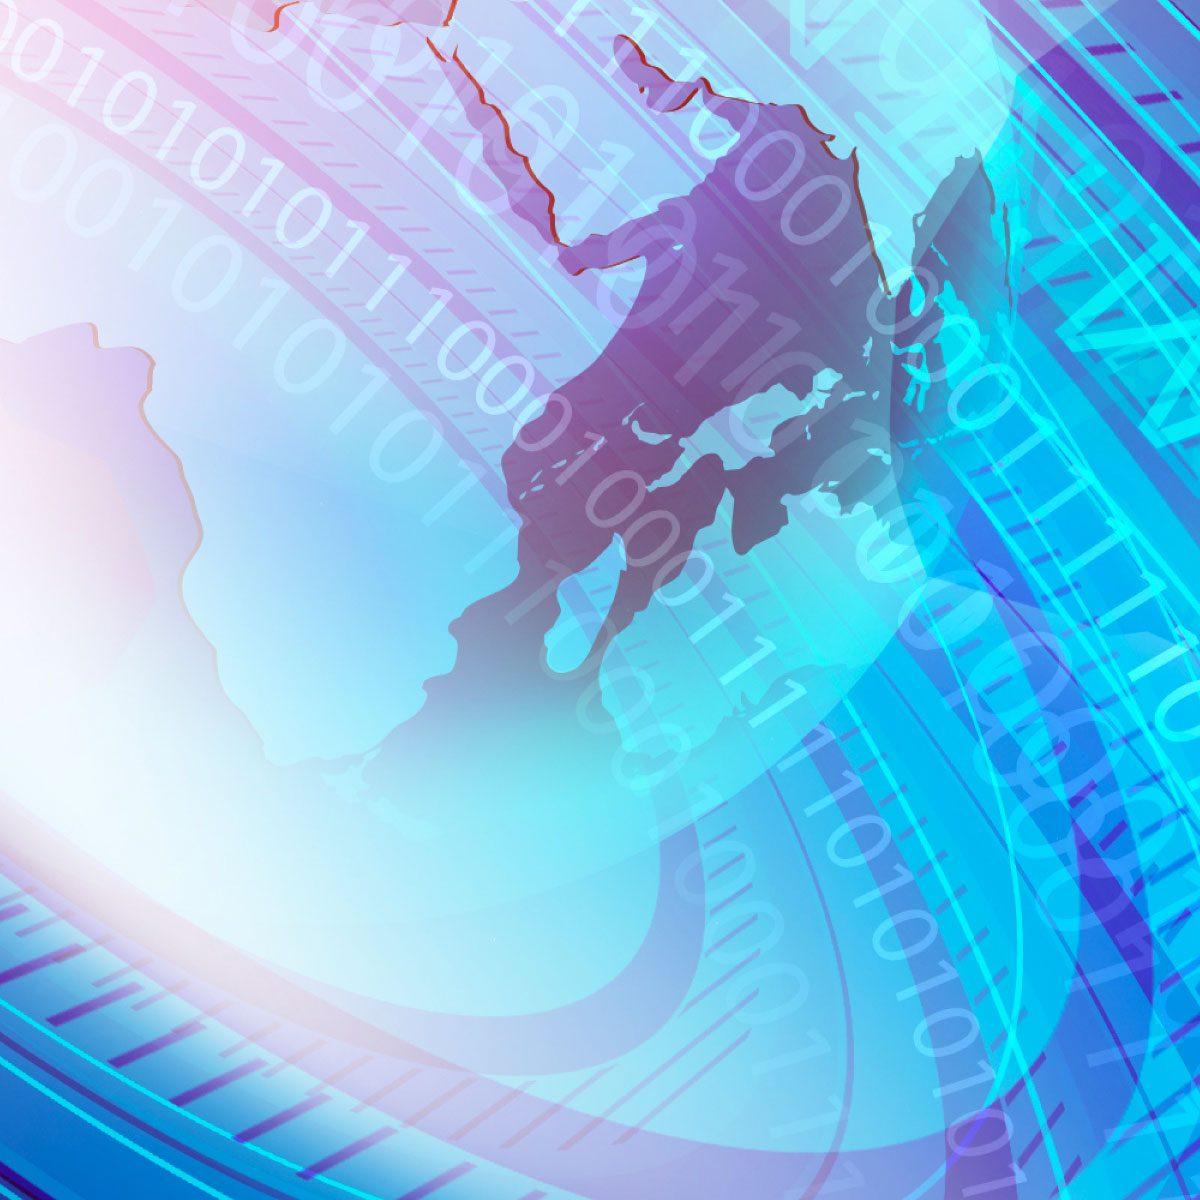 Surecomp Marketplace, trade finance digitization